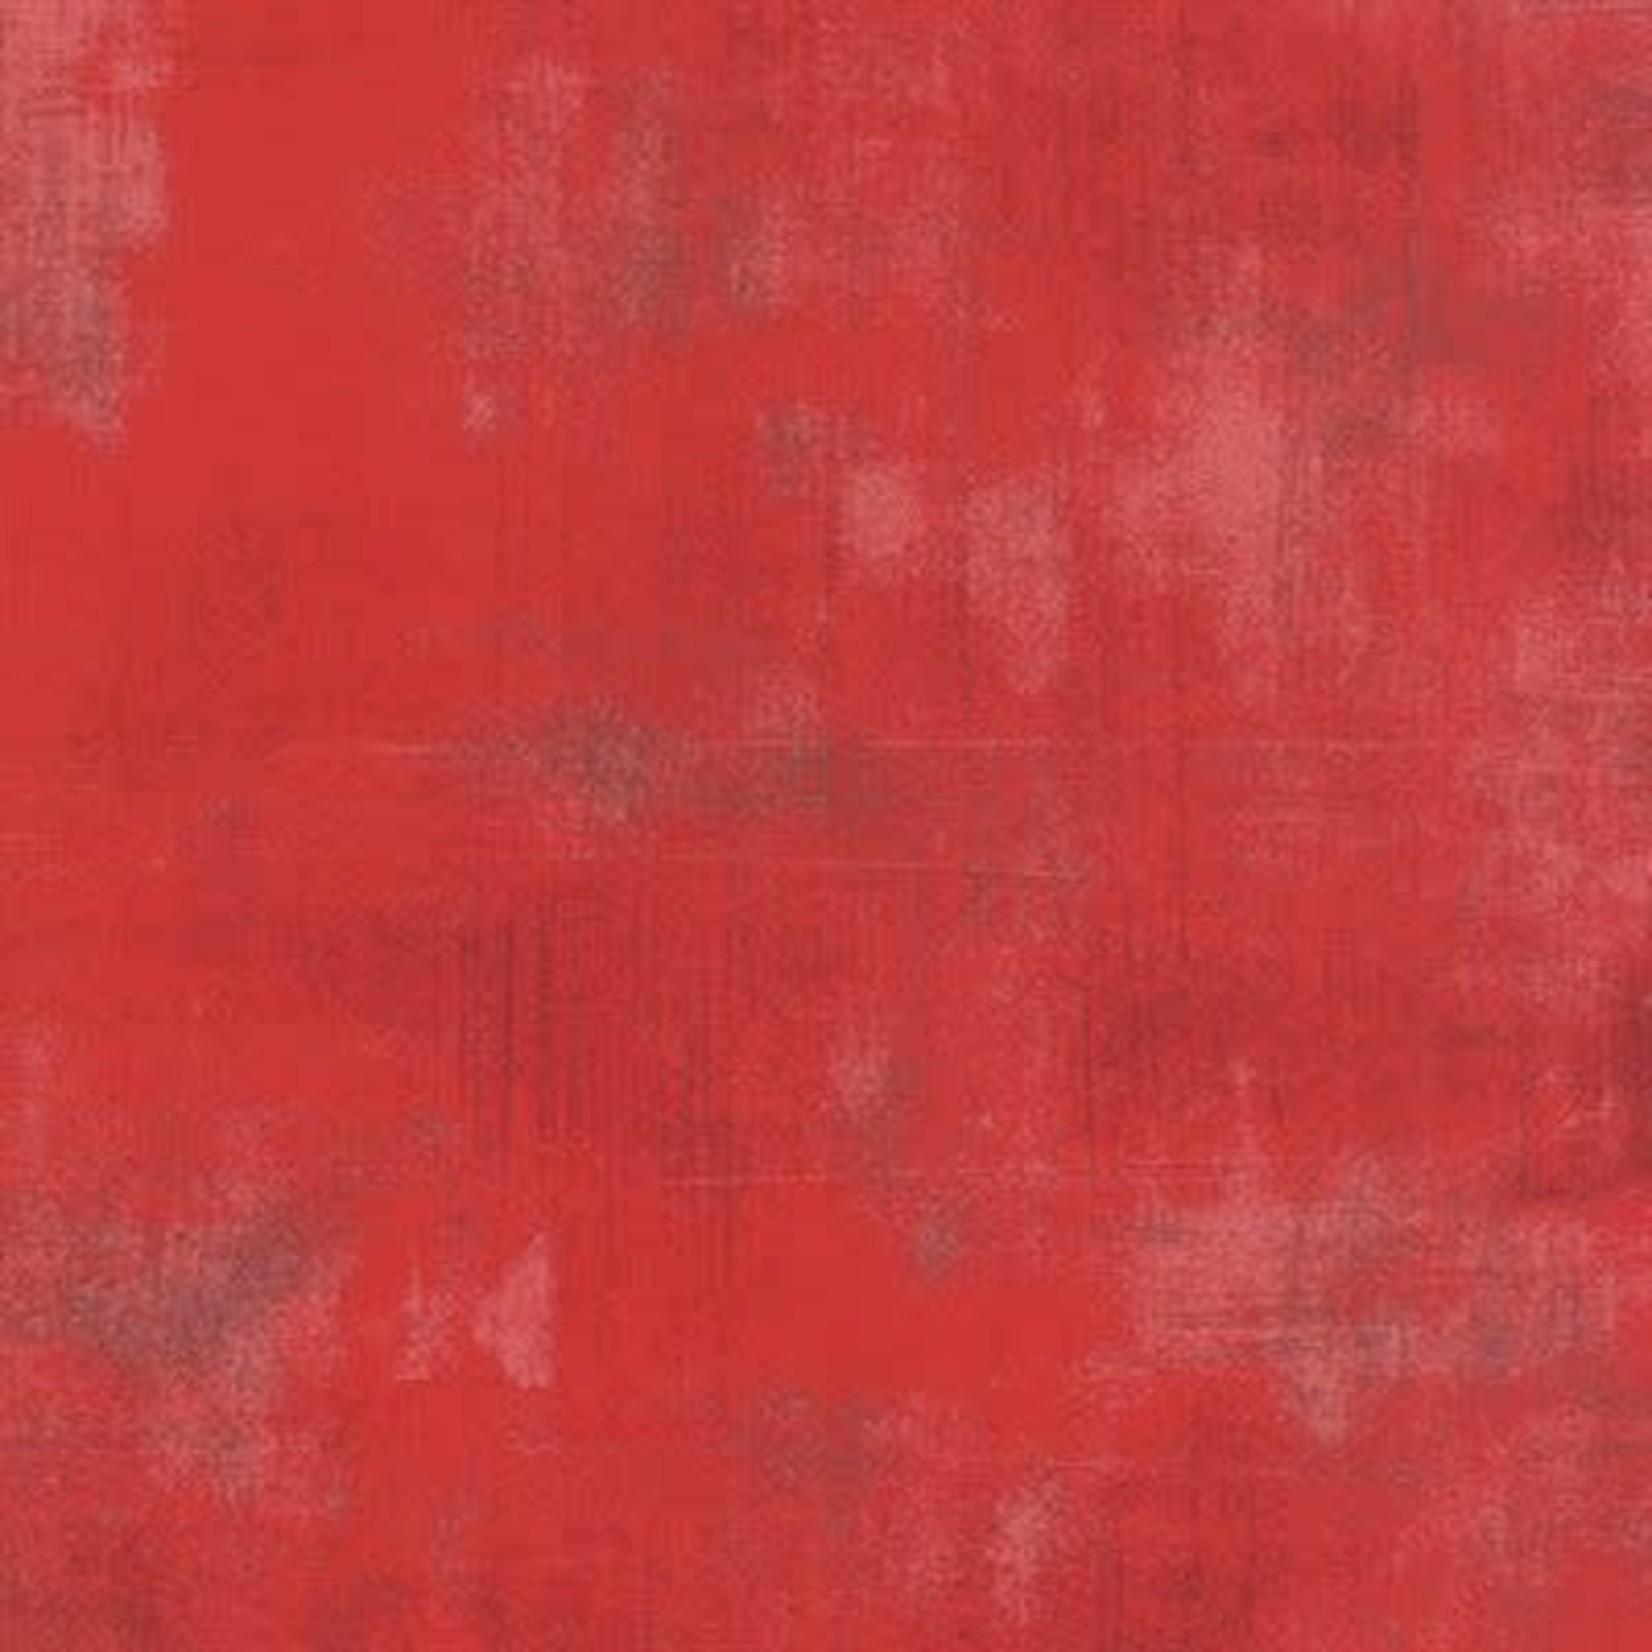 Moda Grunge Basics Grunge - Cherry per cm or $20/m